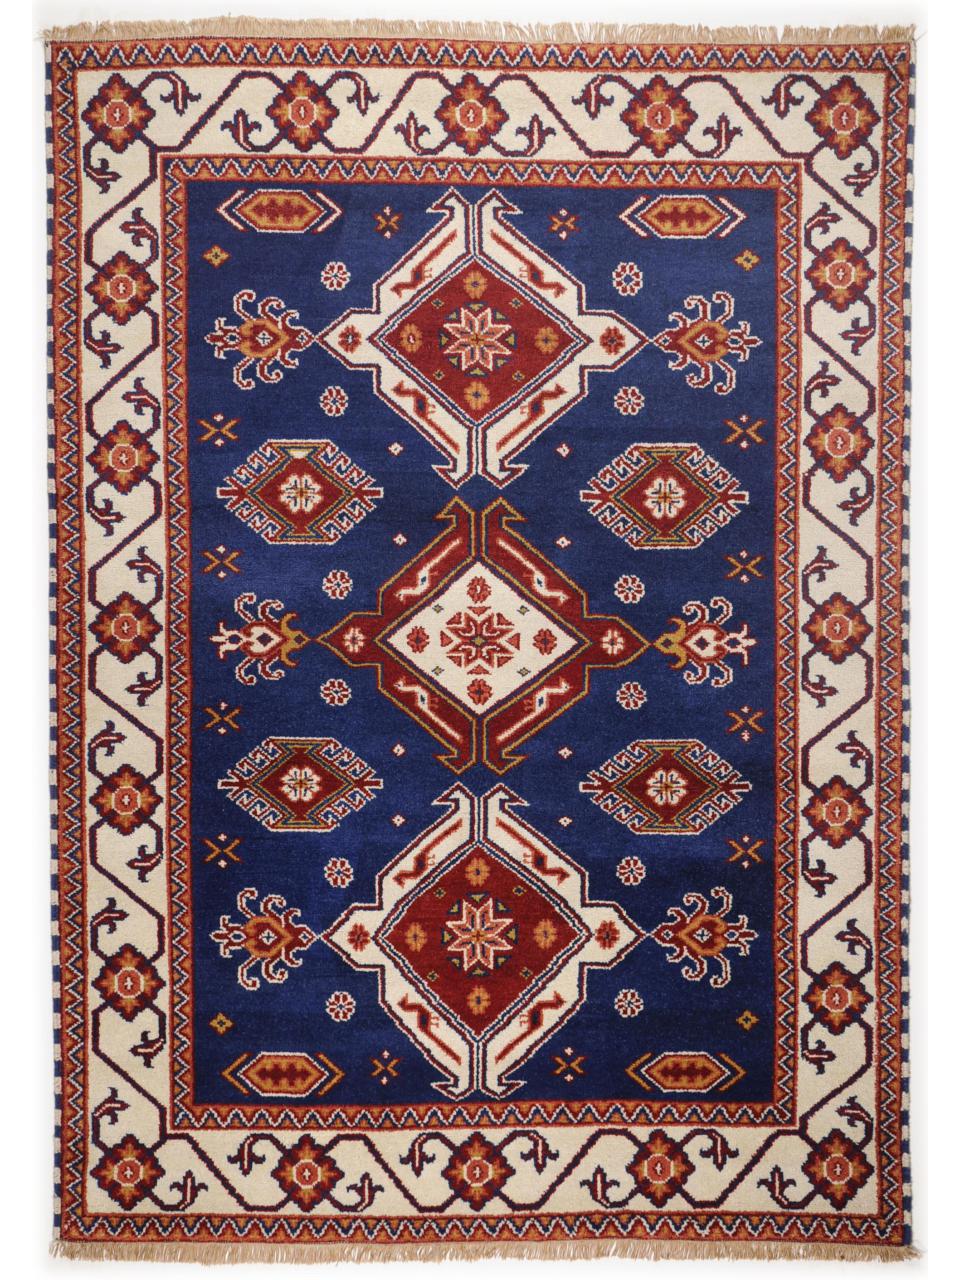 imp rial kazak bleu tapis classiques n 2018 270x70cm. Black Bedroom Furniture Sets. Home Design Ideas